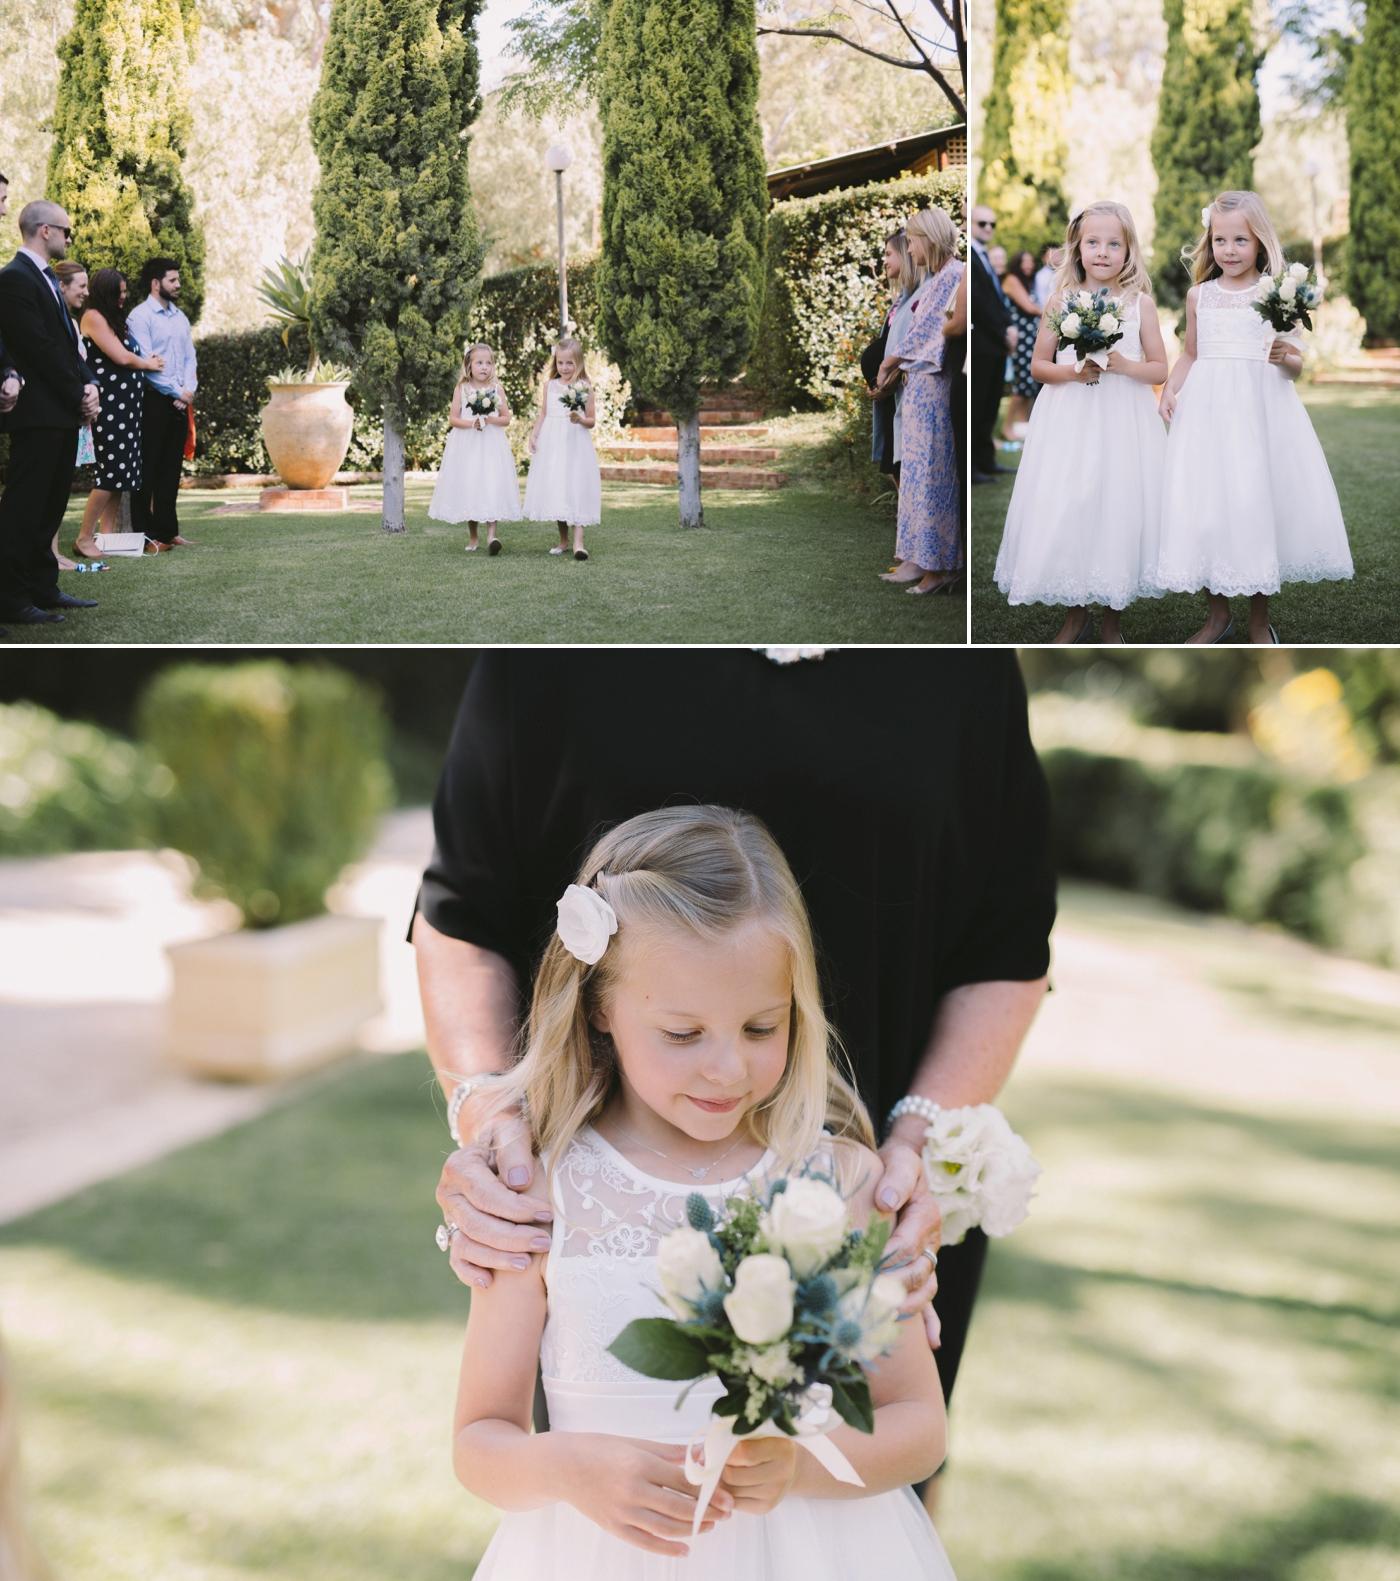 Lauren & Max - Marybank Estate Wedding - Natural wedding photographer in Adelaide - www.katherineschultzphotography.com 56